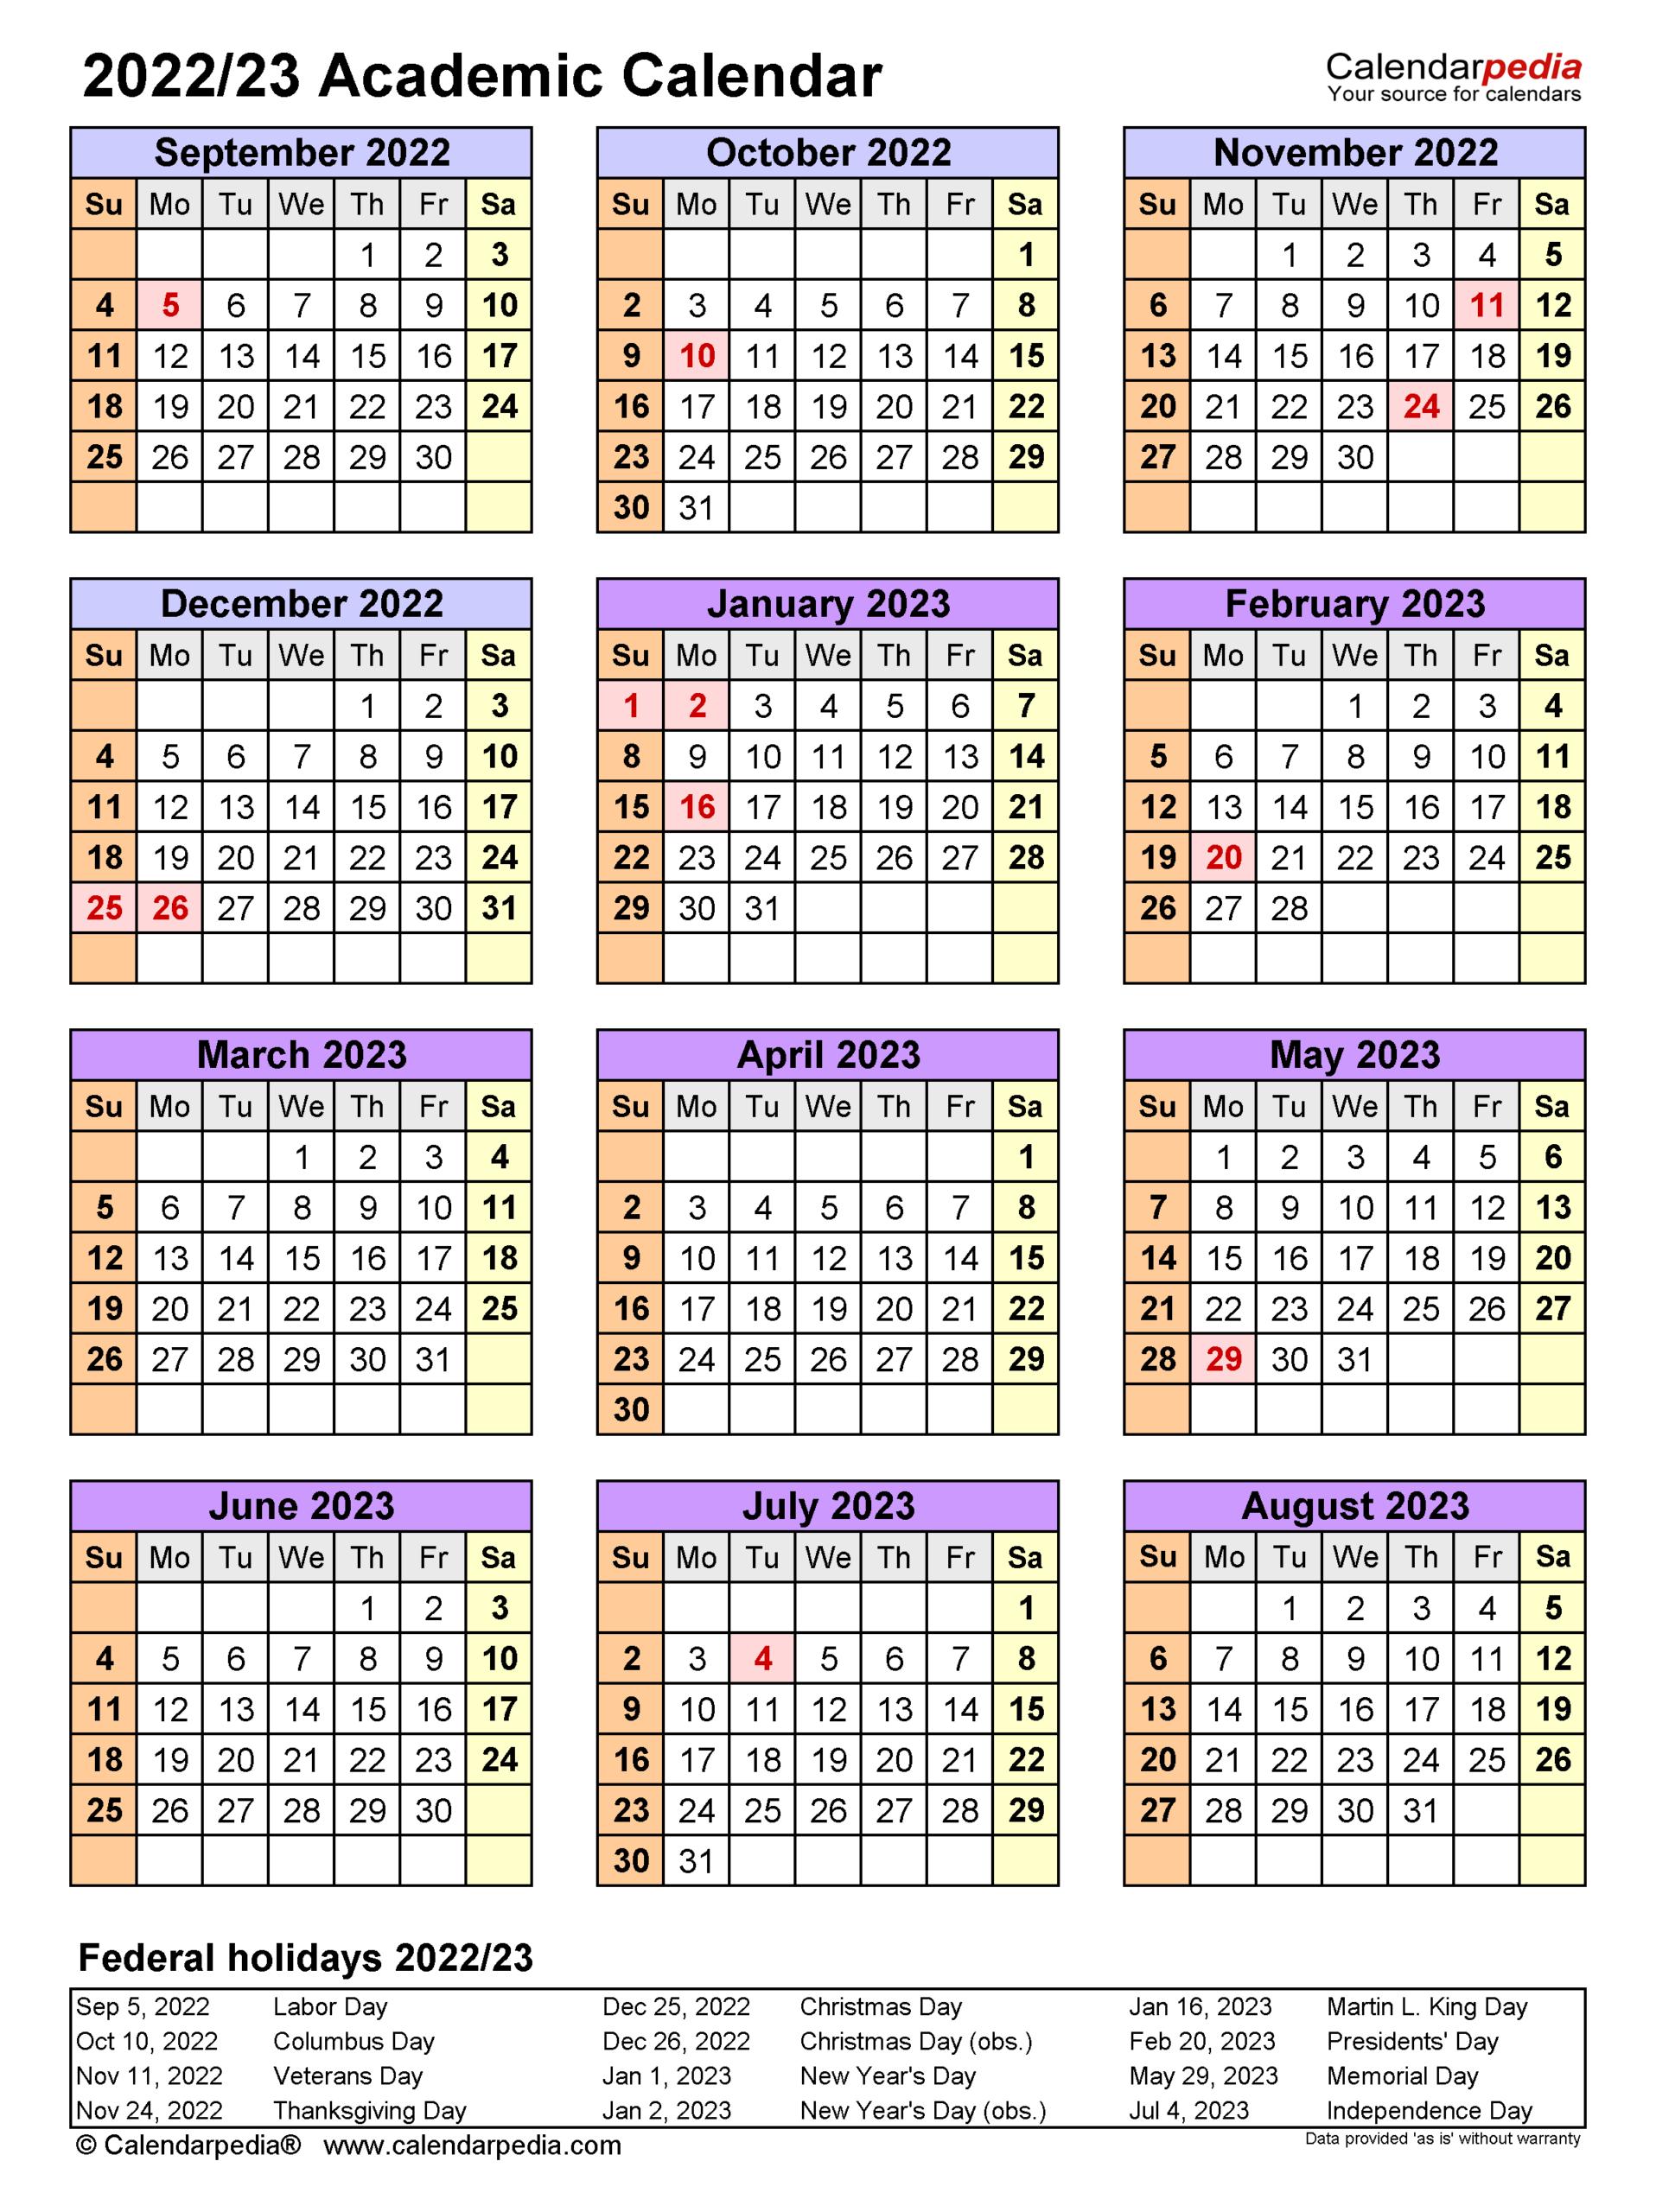 Academic Calendars 2022/2023 - Free Printable Word Templates inside Aiken County 2022 2023 School Calendar